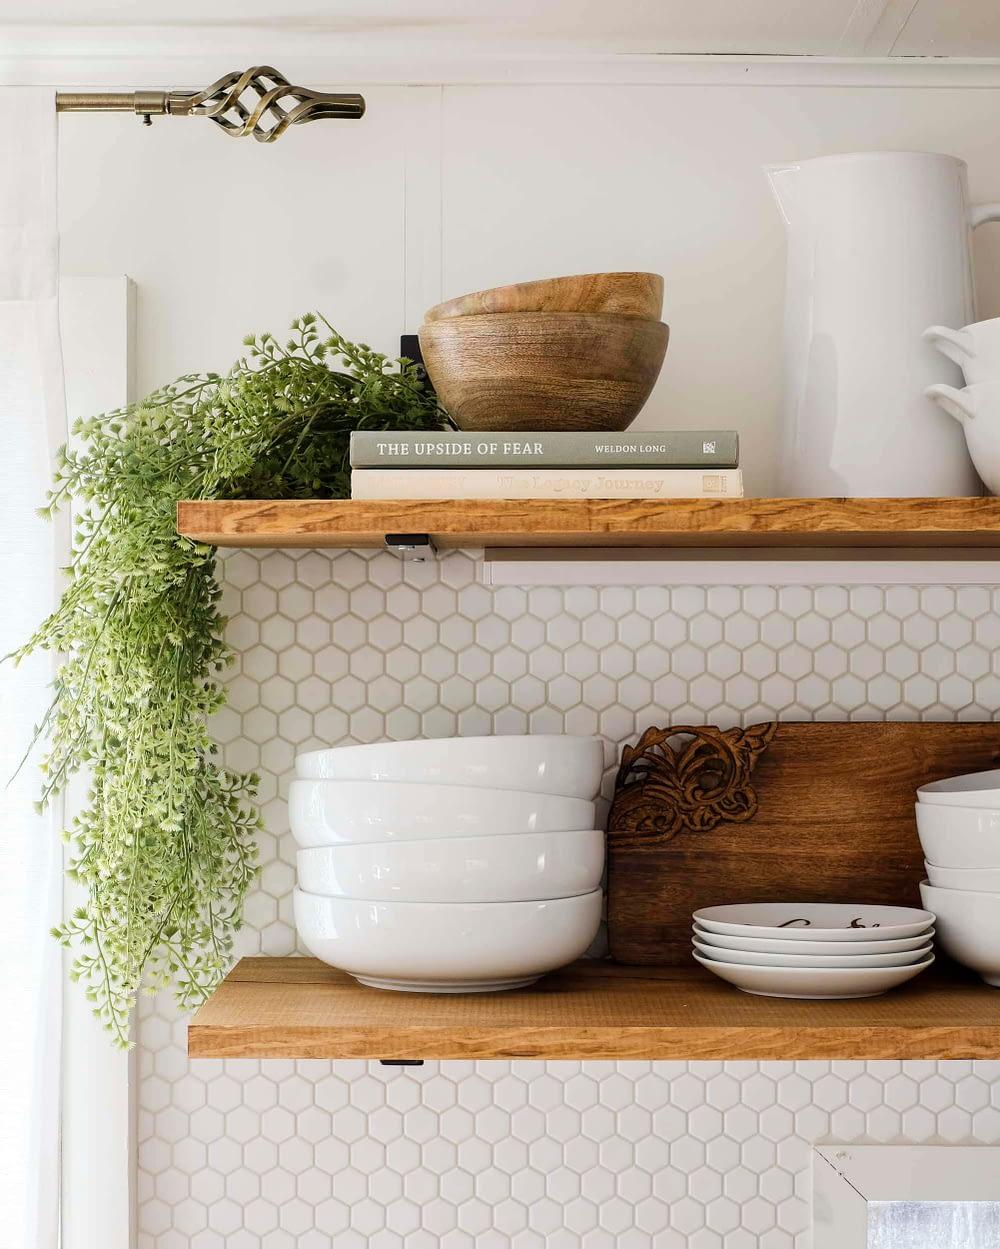 RV kitchen remodel with open shelving and hexagon tile backsplash